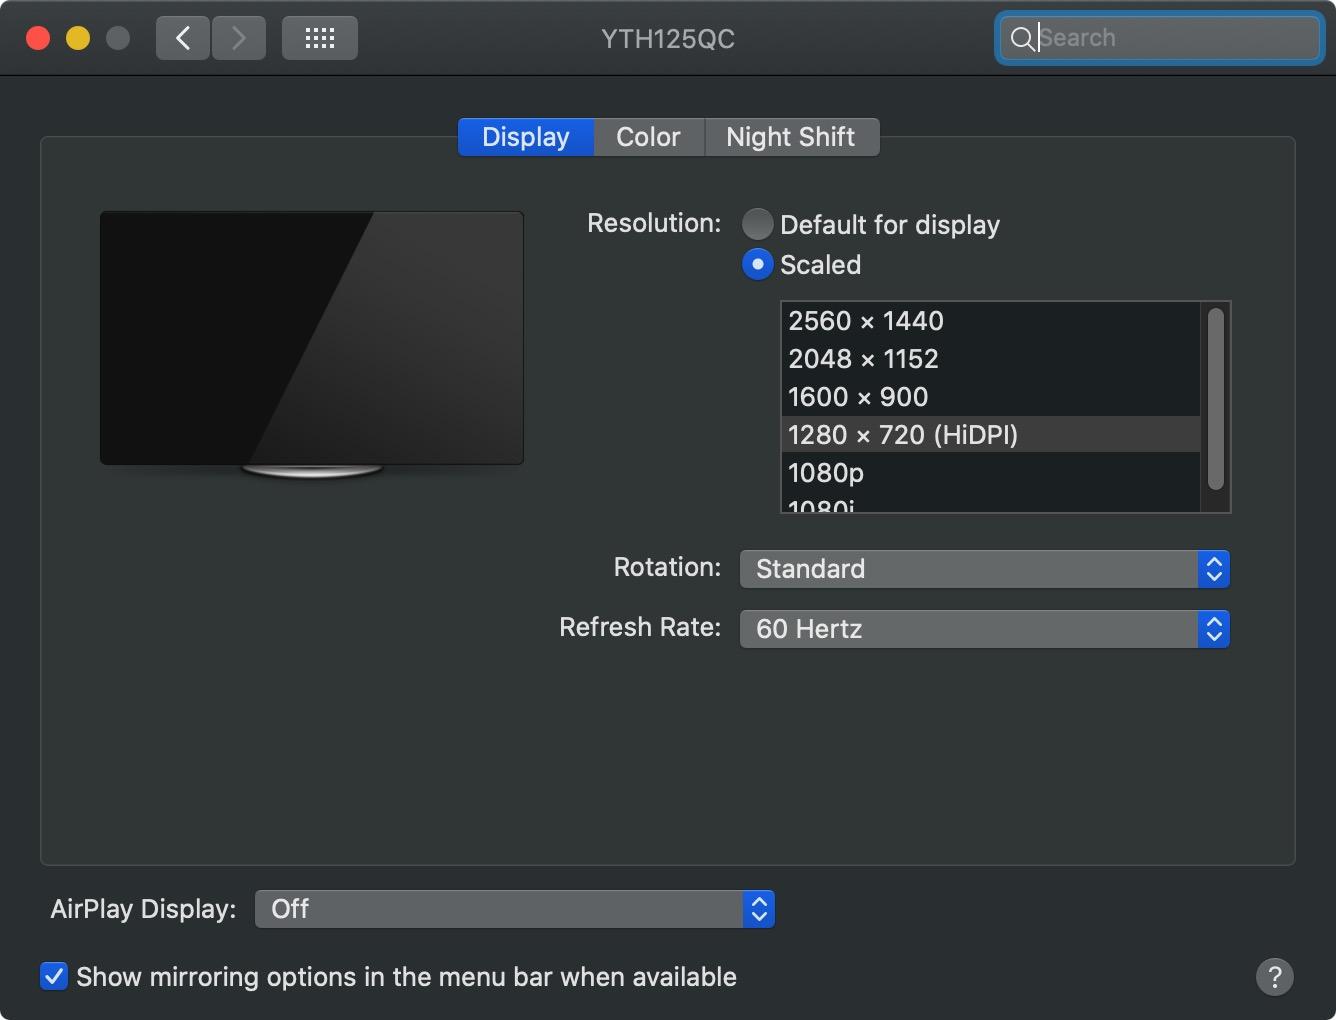 Screen Shot 2020-02-15 at 23.36.49.jpg